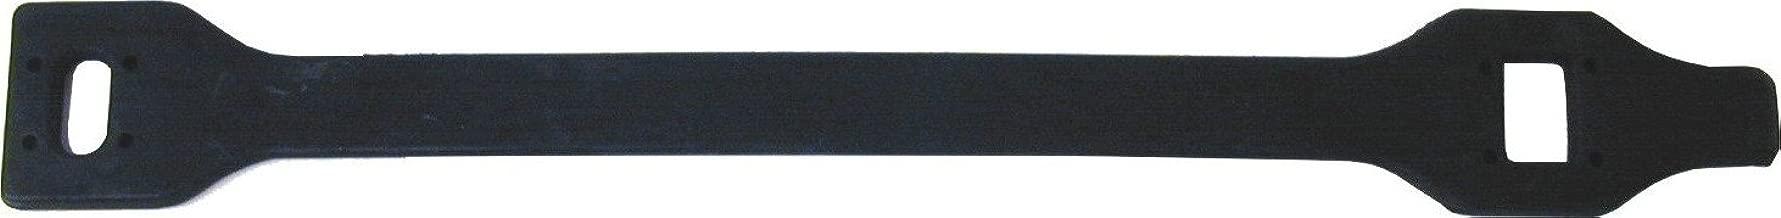 URO Parts 91111036501 Air Box Cover Strap